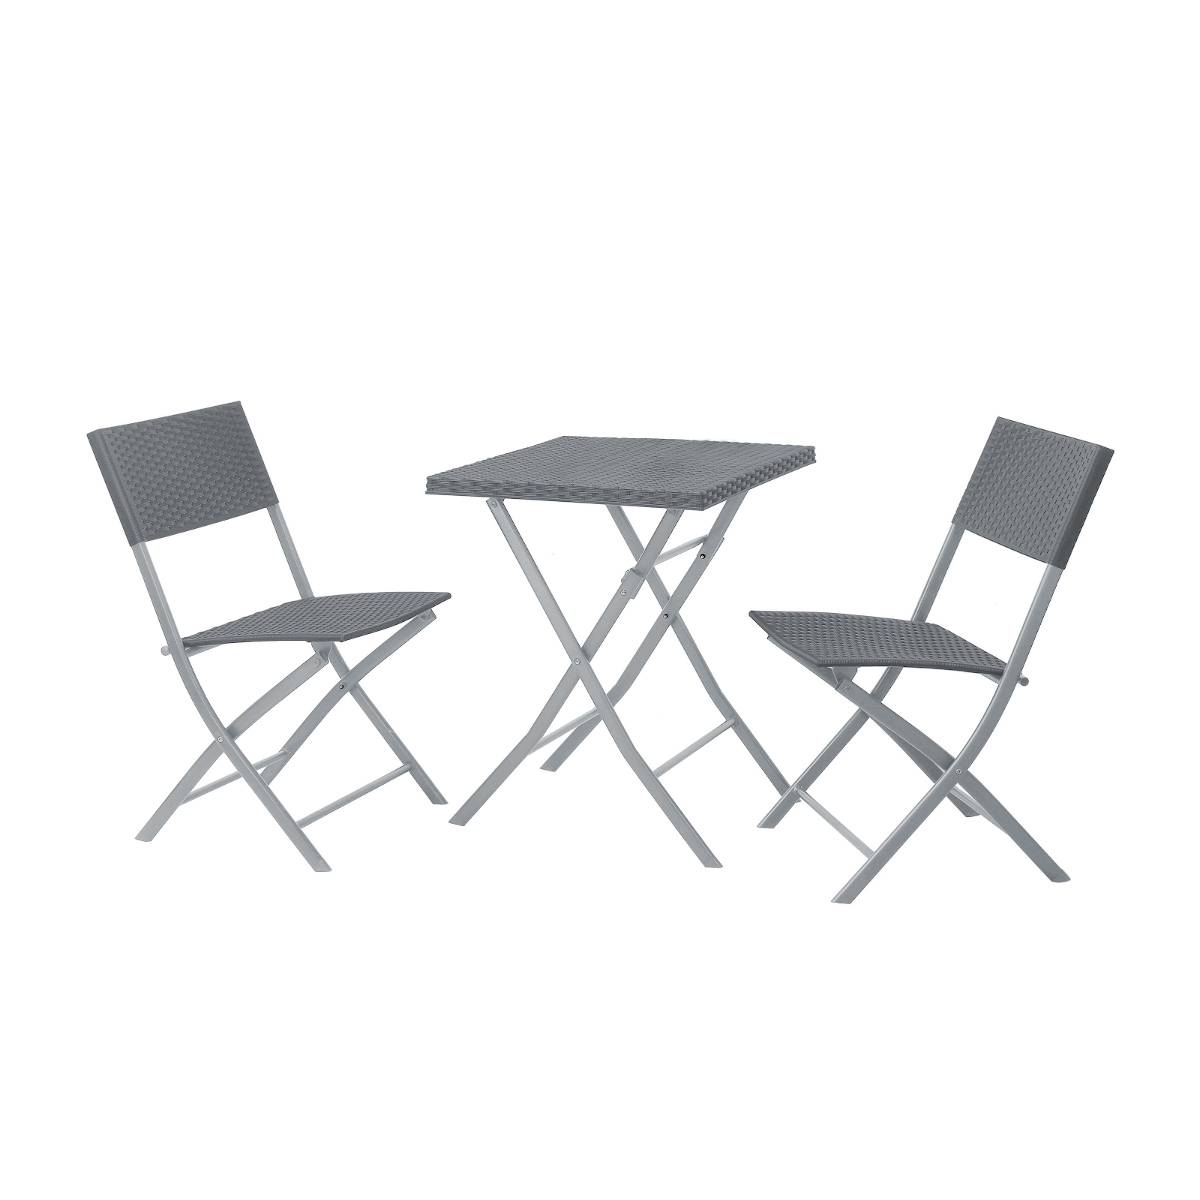 90595 SVITA Poly-Rattan Bistro-Set Tisch Stuhl Klappbar Rattan-Set Grau